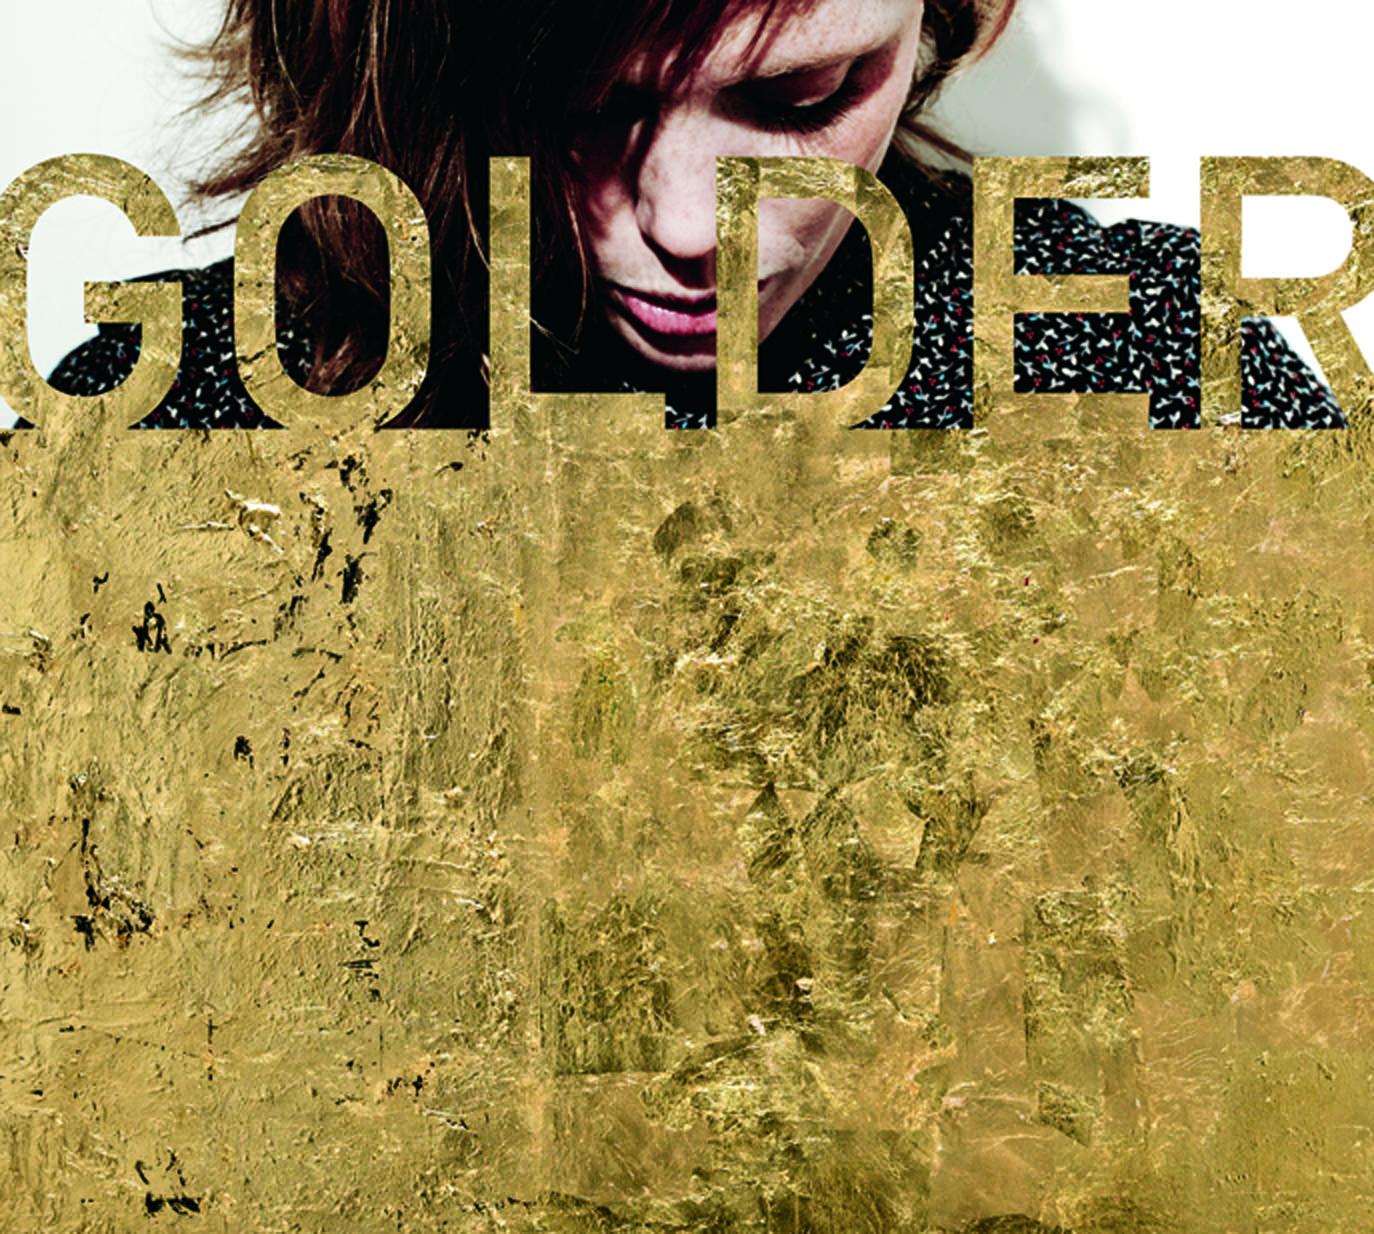 Golder